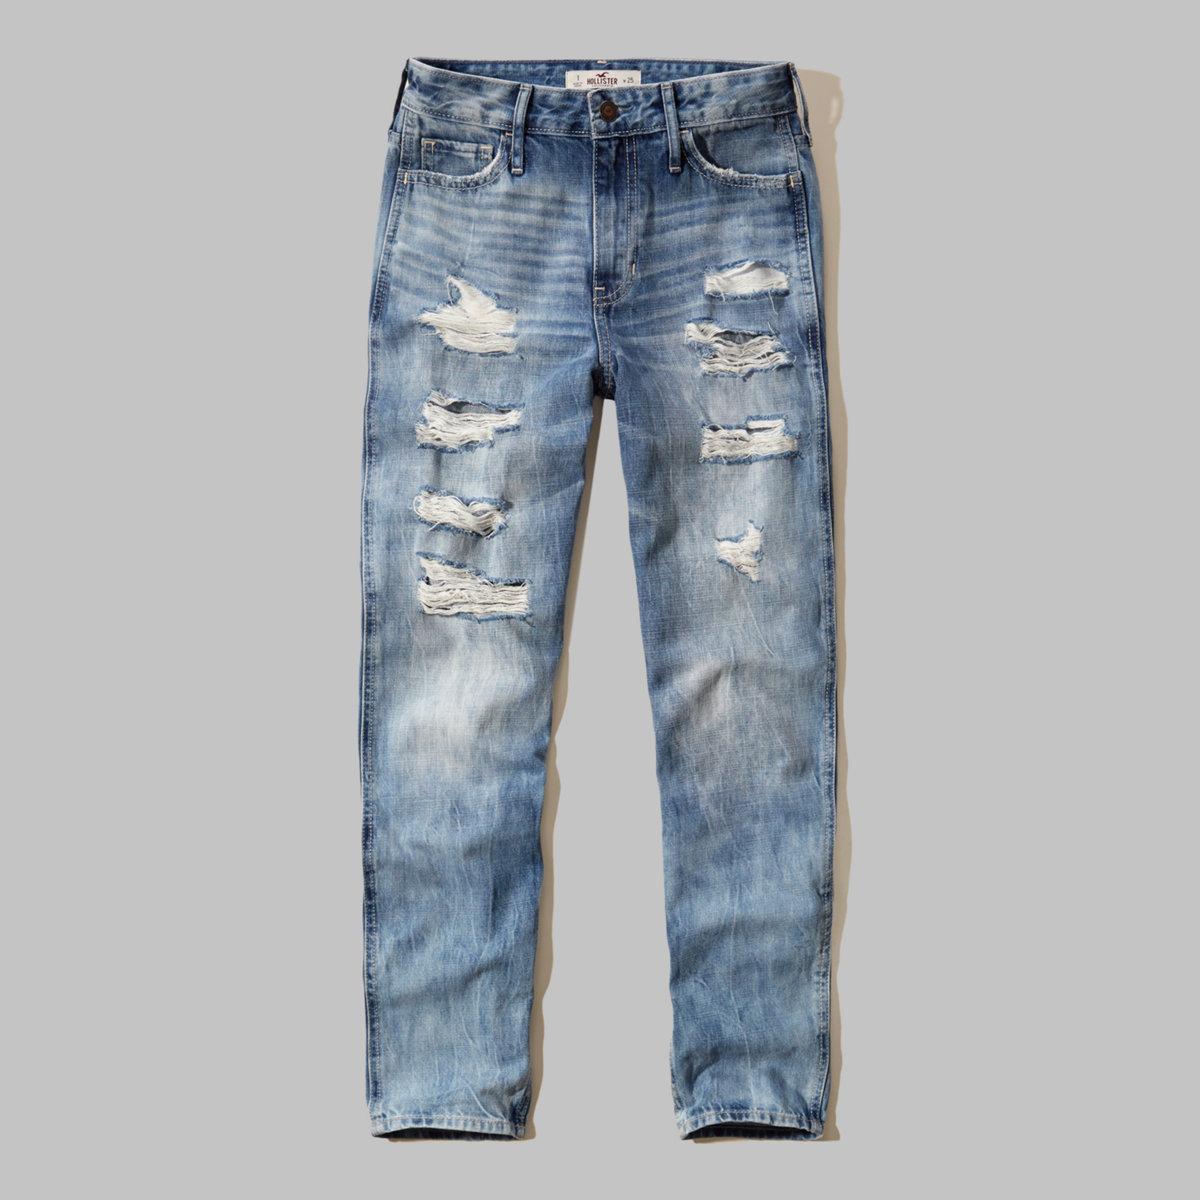 Hollister Girlfriend Jeans